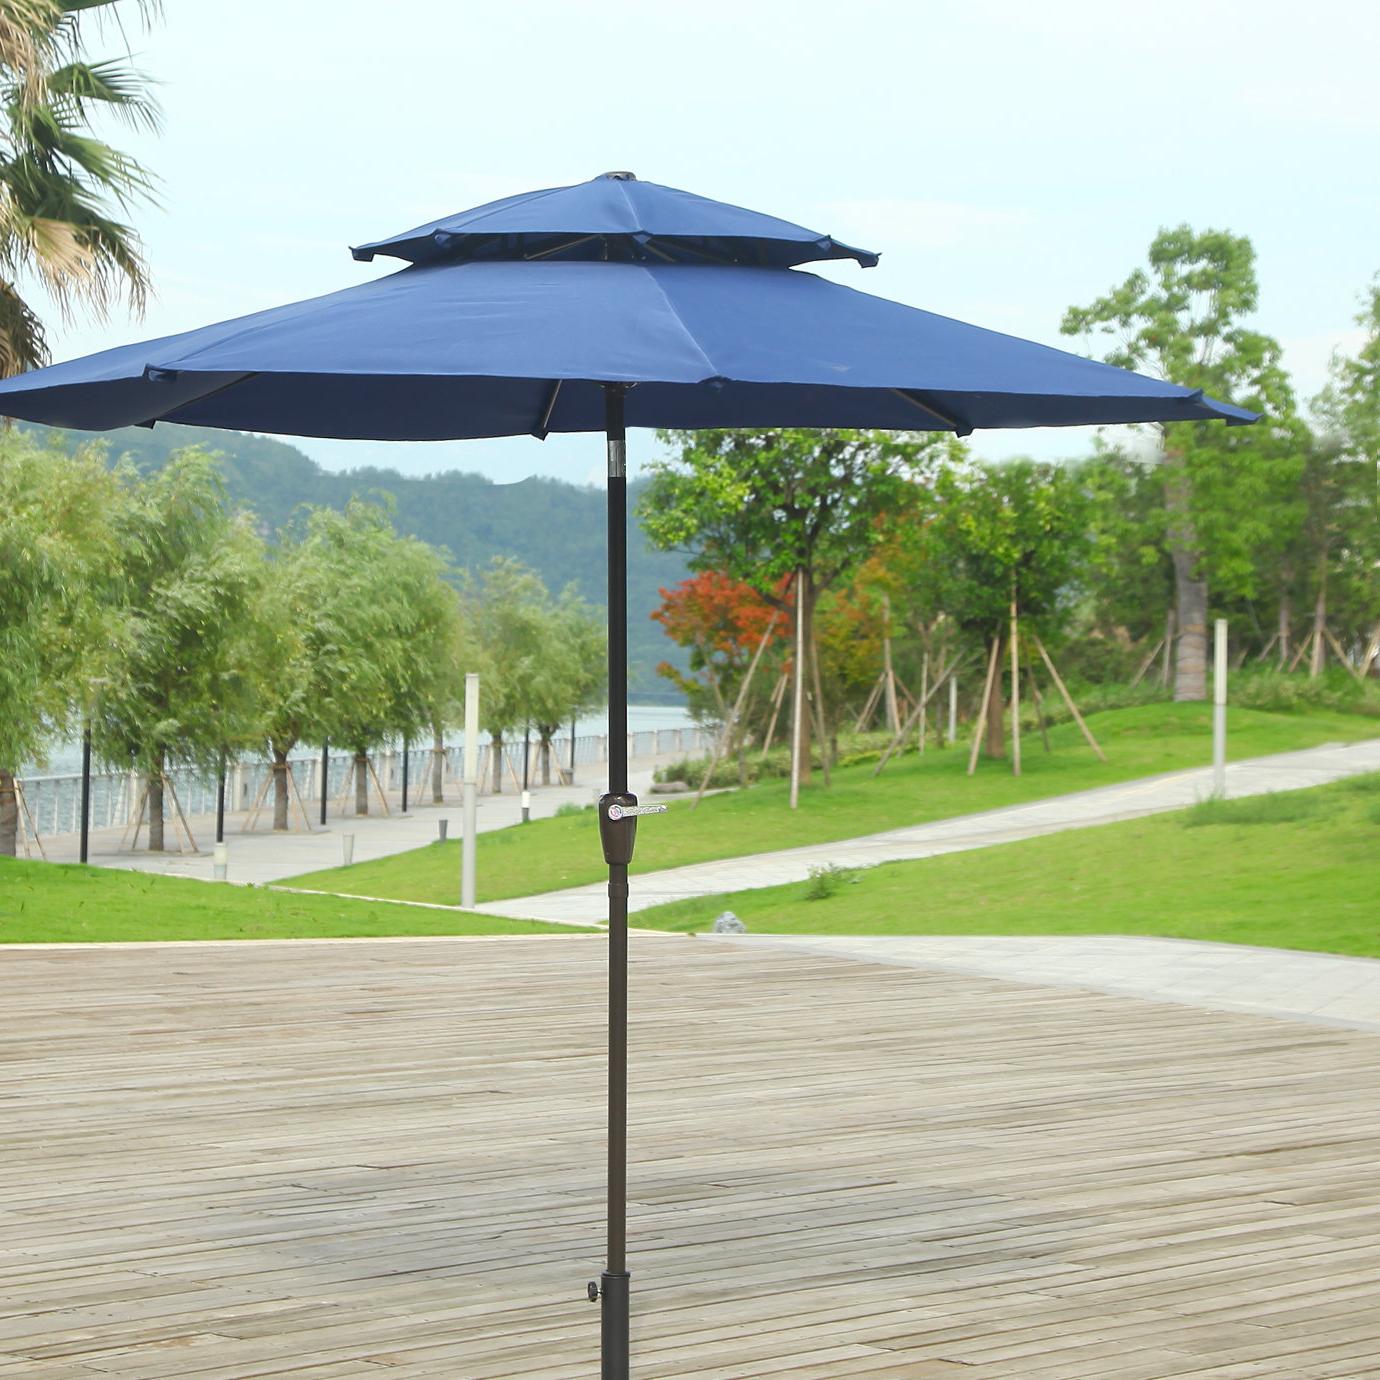 Most Recently Released Dimond 9' Market Umbrella In Aldan Market Umbrellas (View 13 of 20)